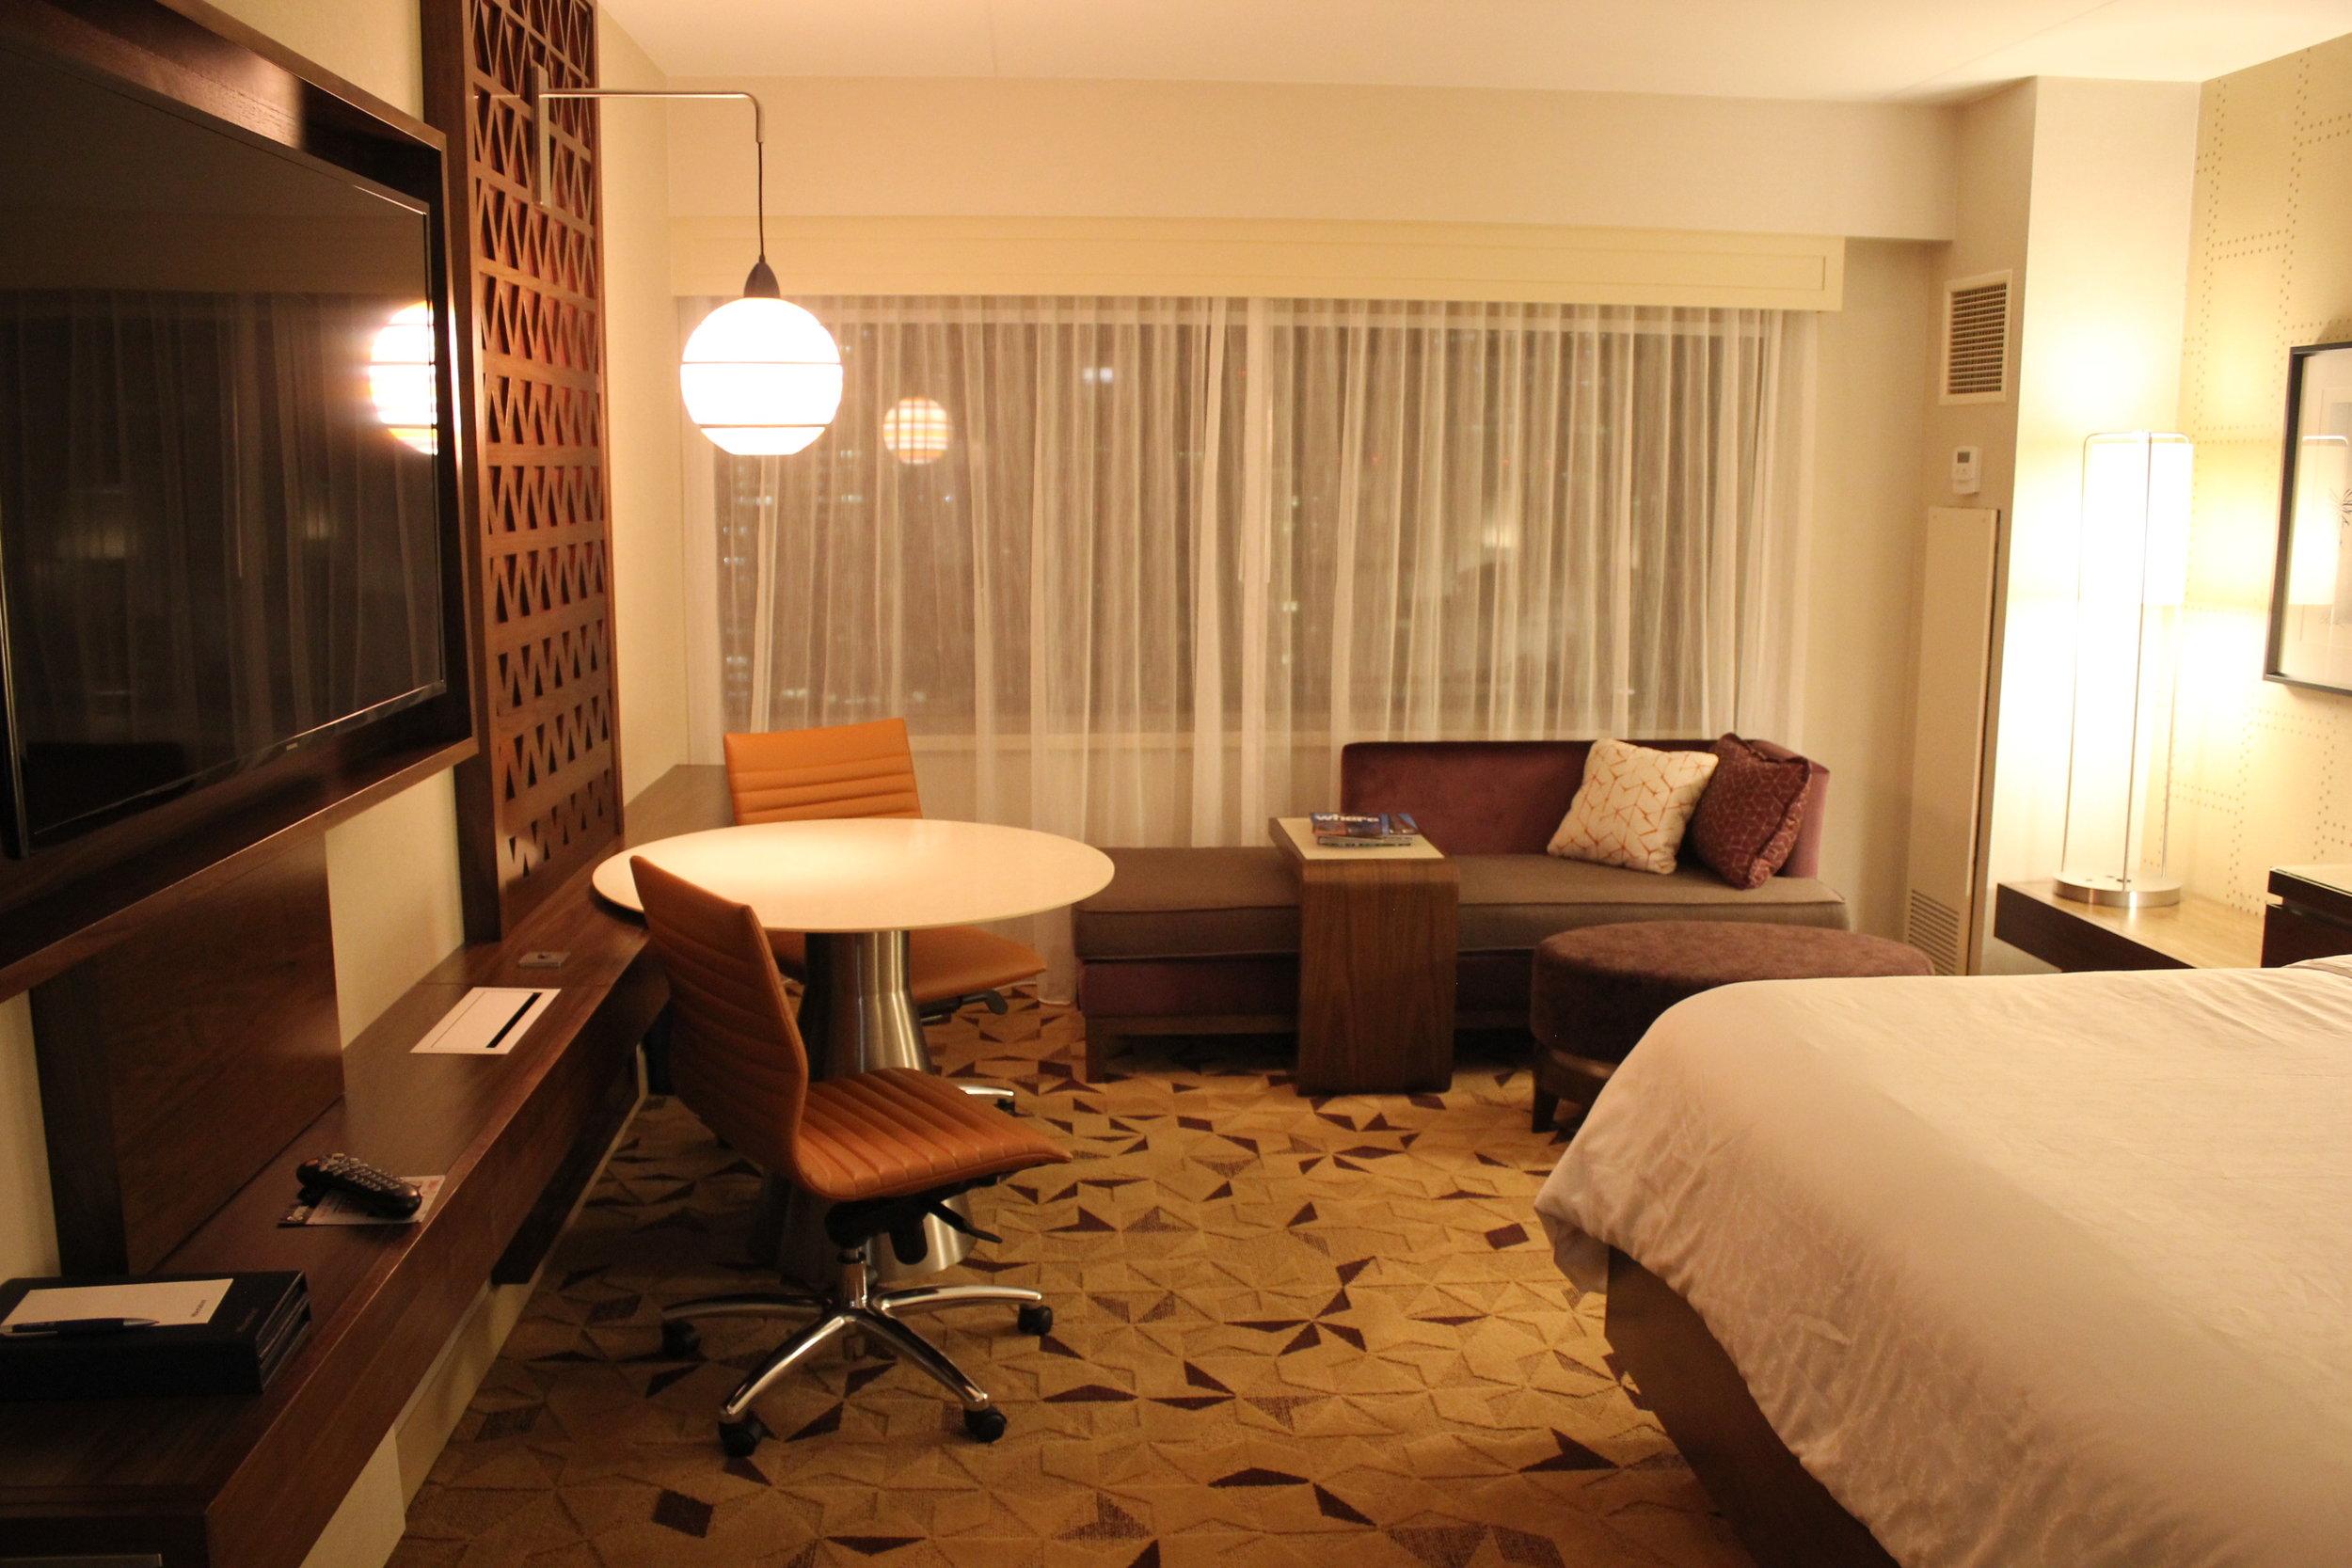 Sheraton Seattle – Room